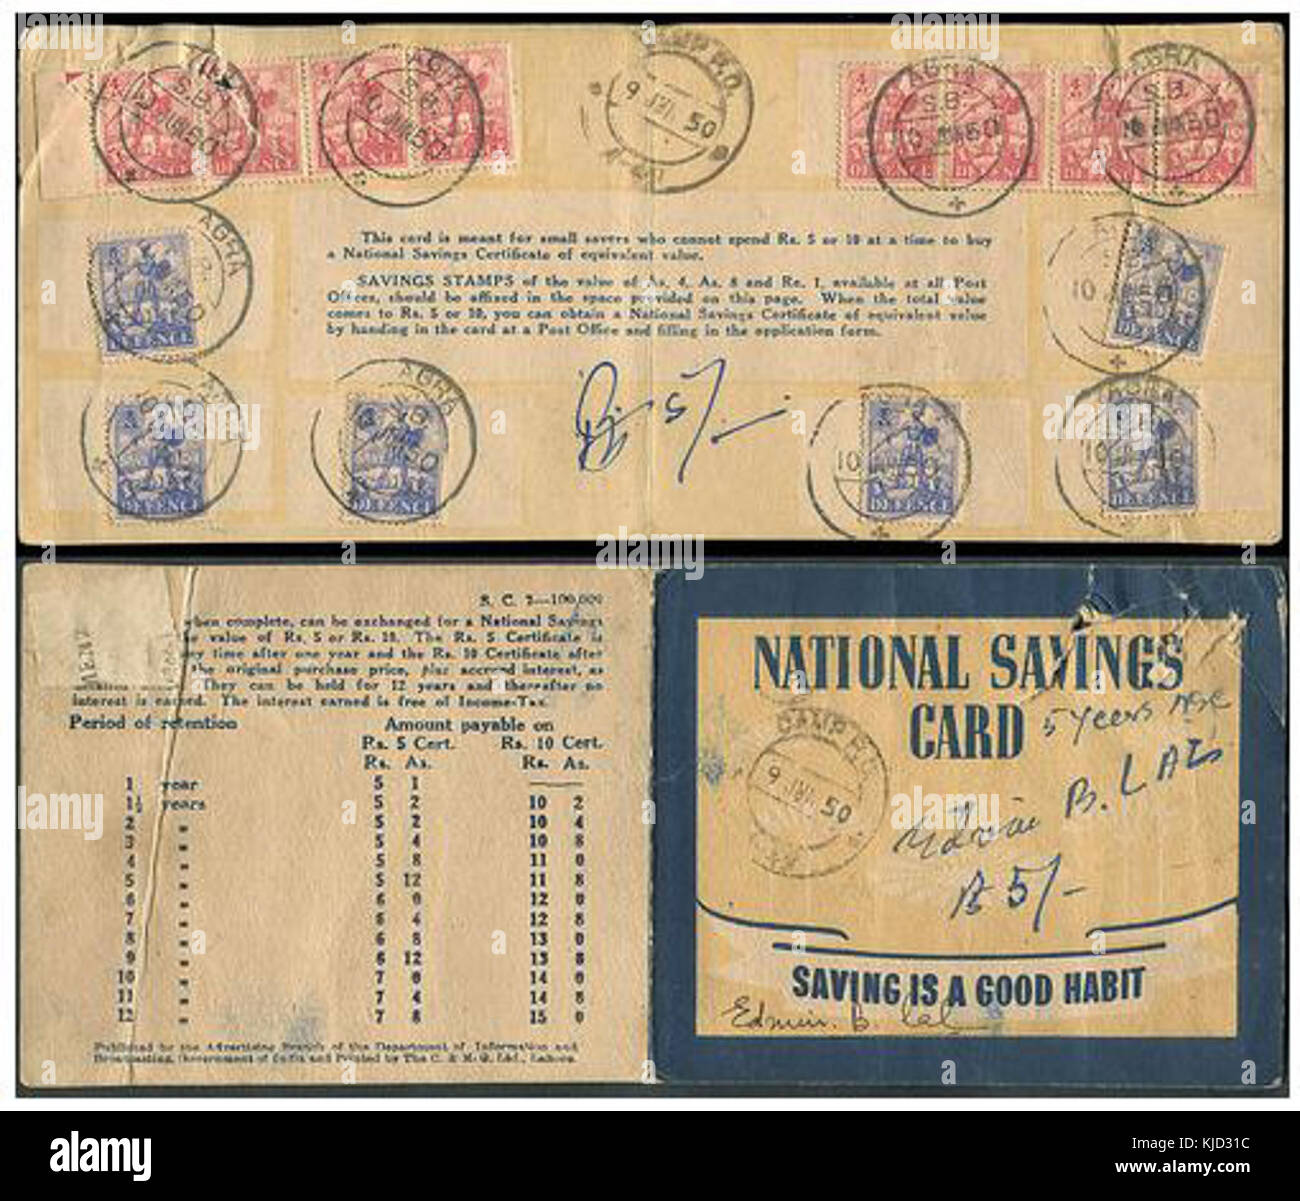 National savings book stock photos national savings book stock indian national savings card 1950 stock image 1betcityfo Choice Image